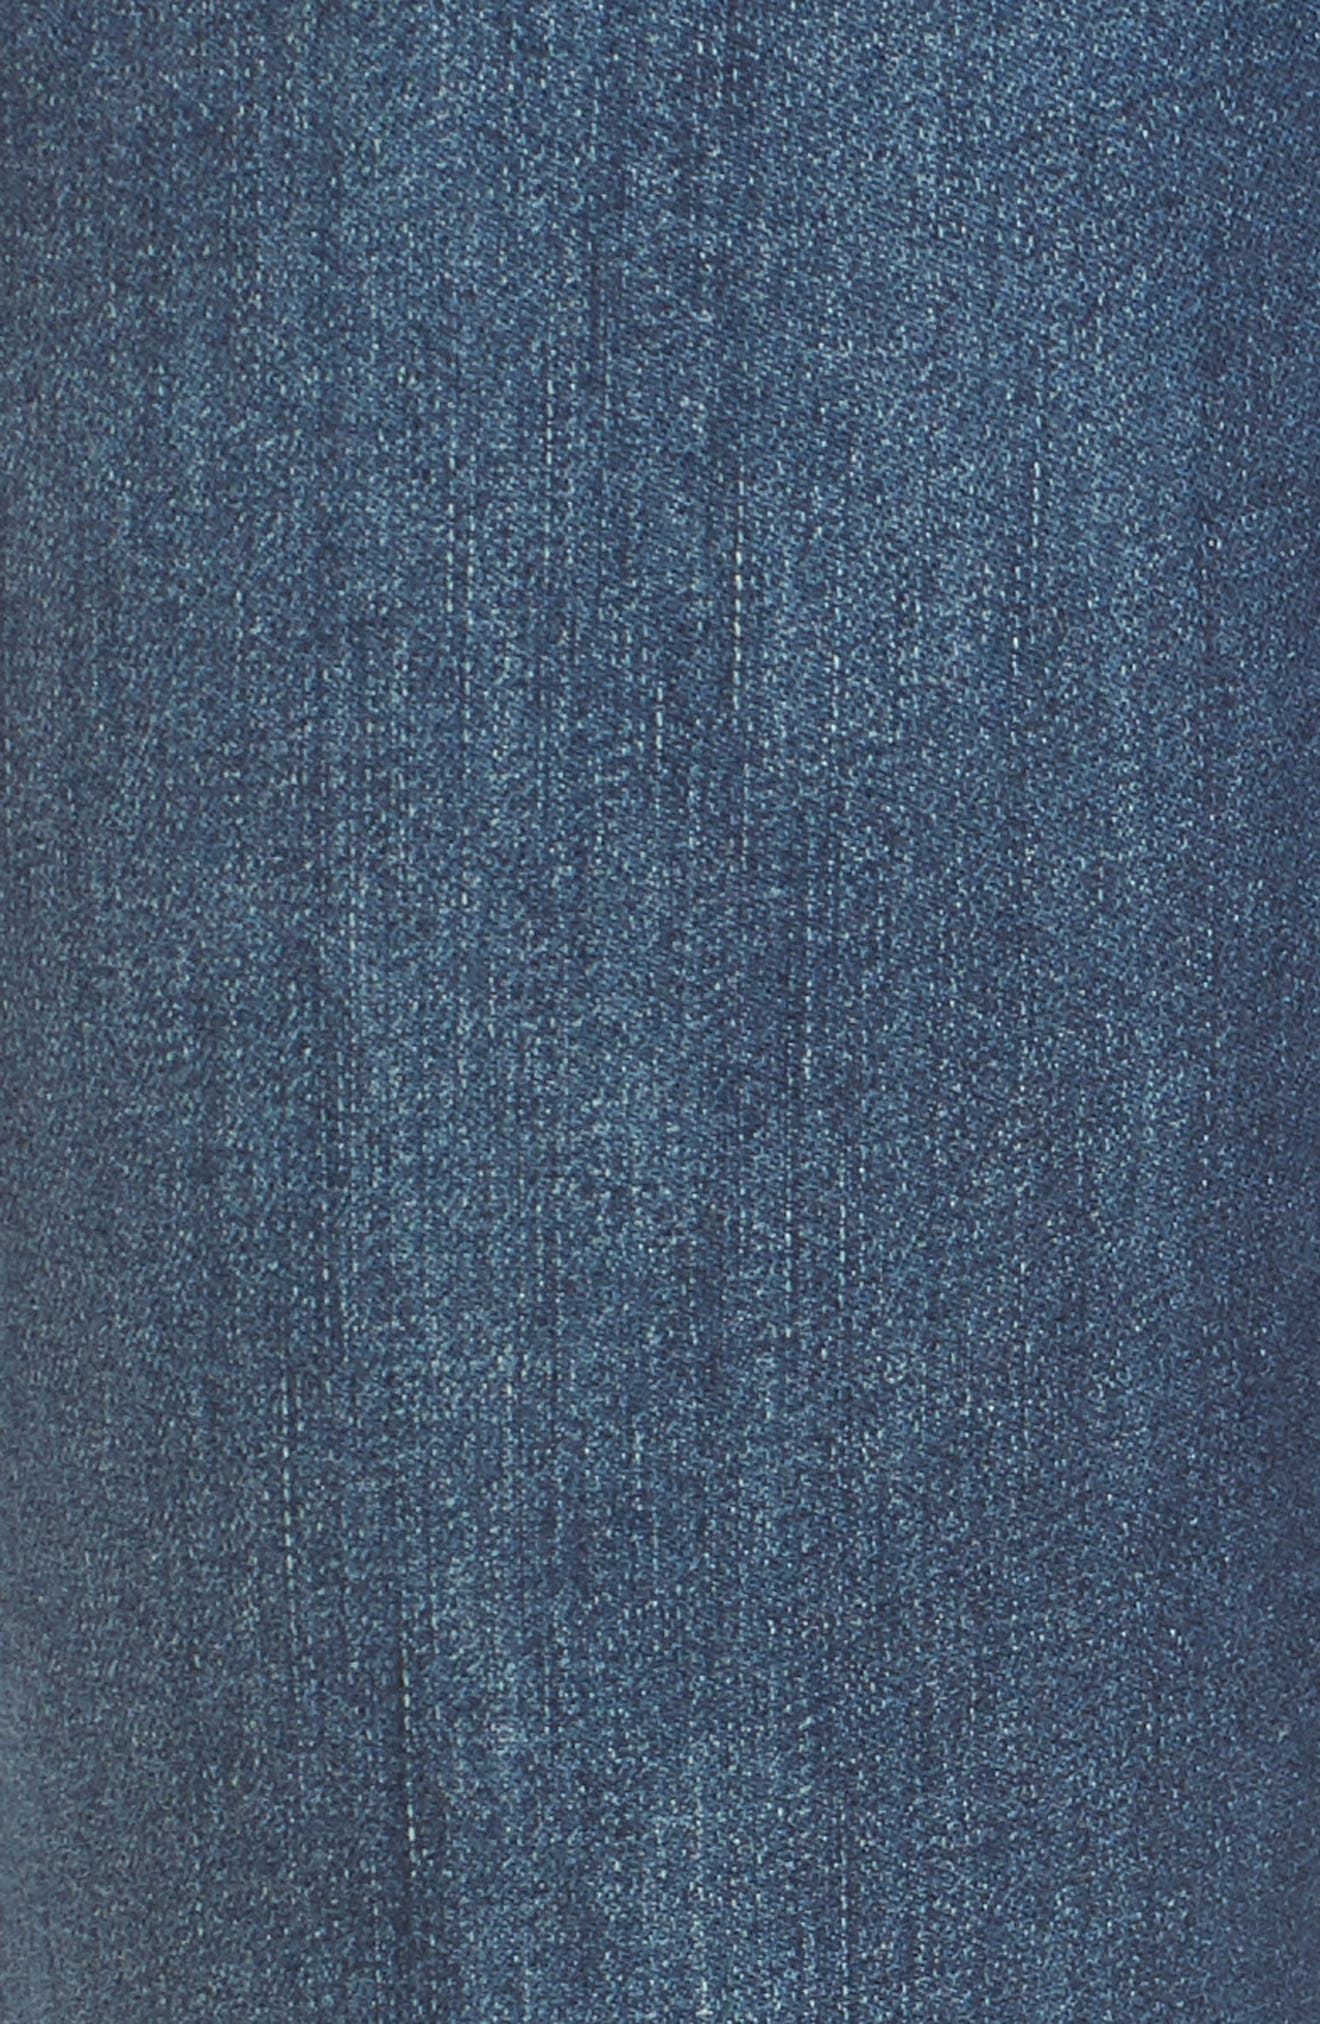 Tabitha Release Hem Crop Jeans,                             Alternate thumbnail 6, color,                             403